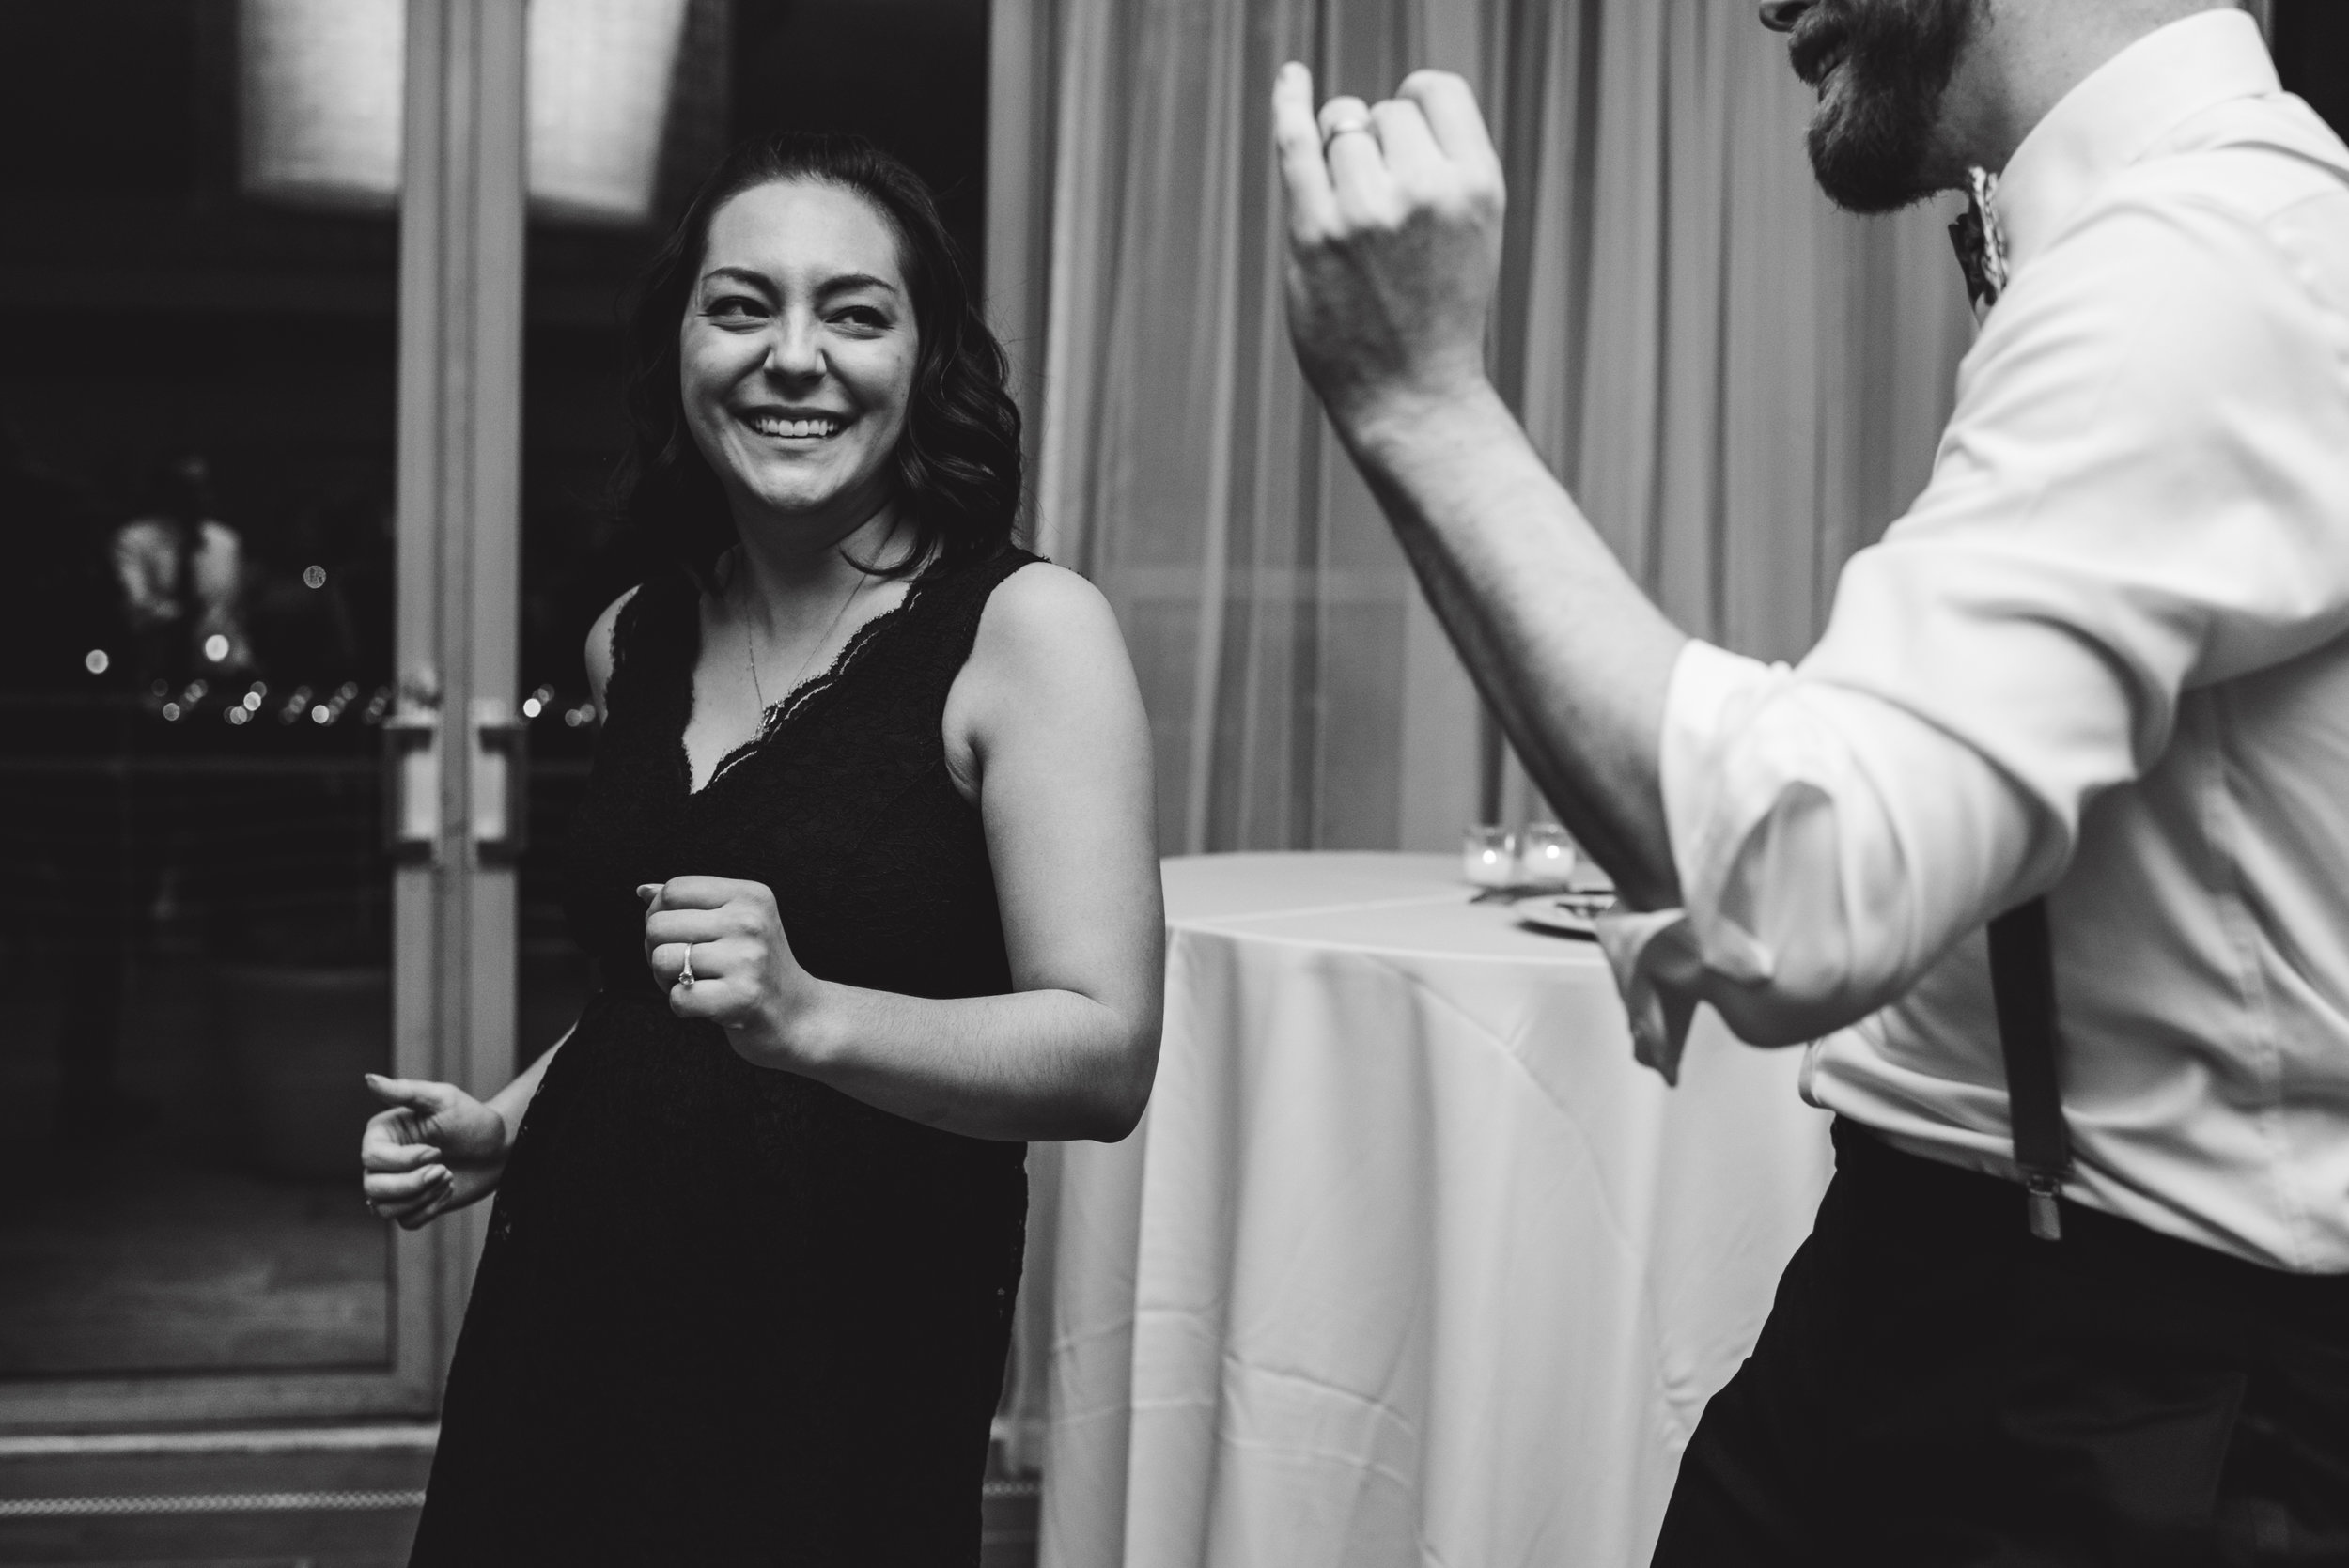 LIZA & JON - BATTERY PARK WEDDING - NYC INTIMATE WEDDING PHOTOGRAPHER - CHI-CHI AGBIM-865.jpg